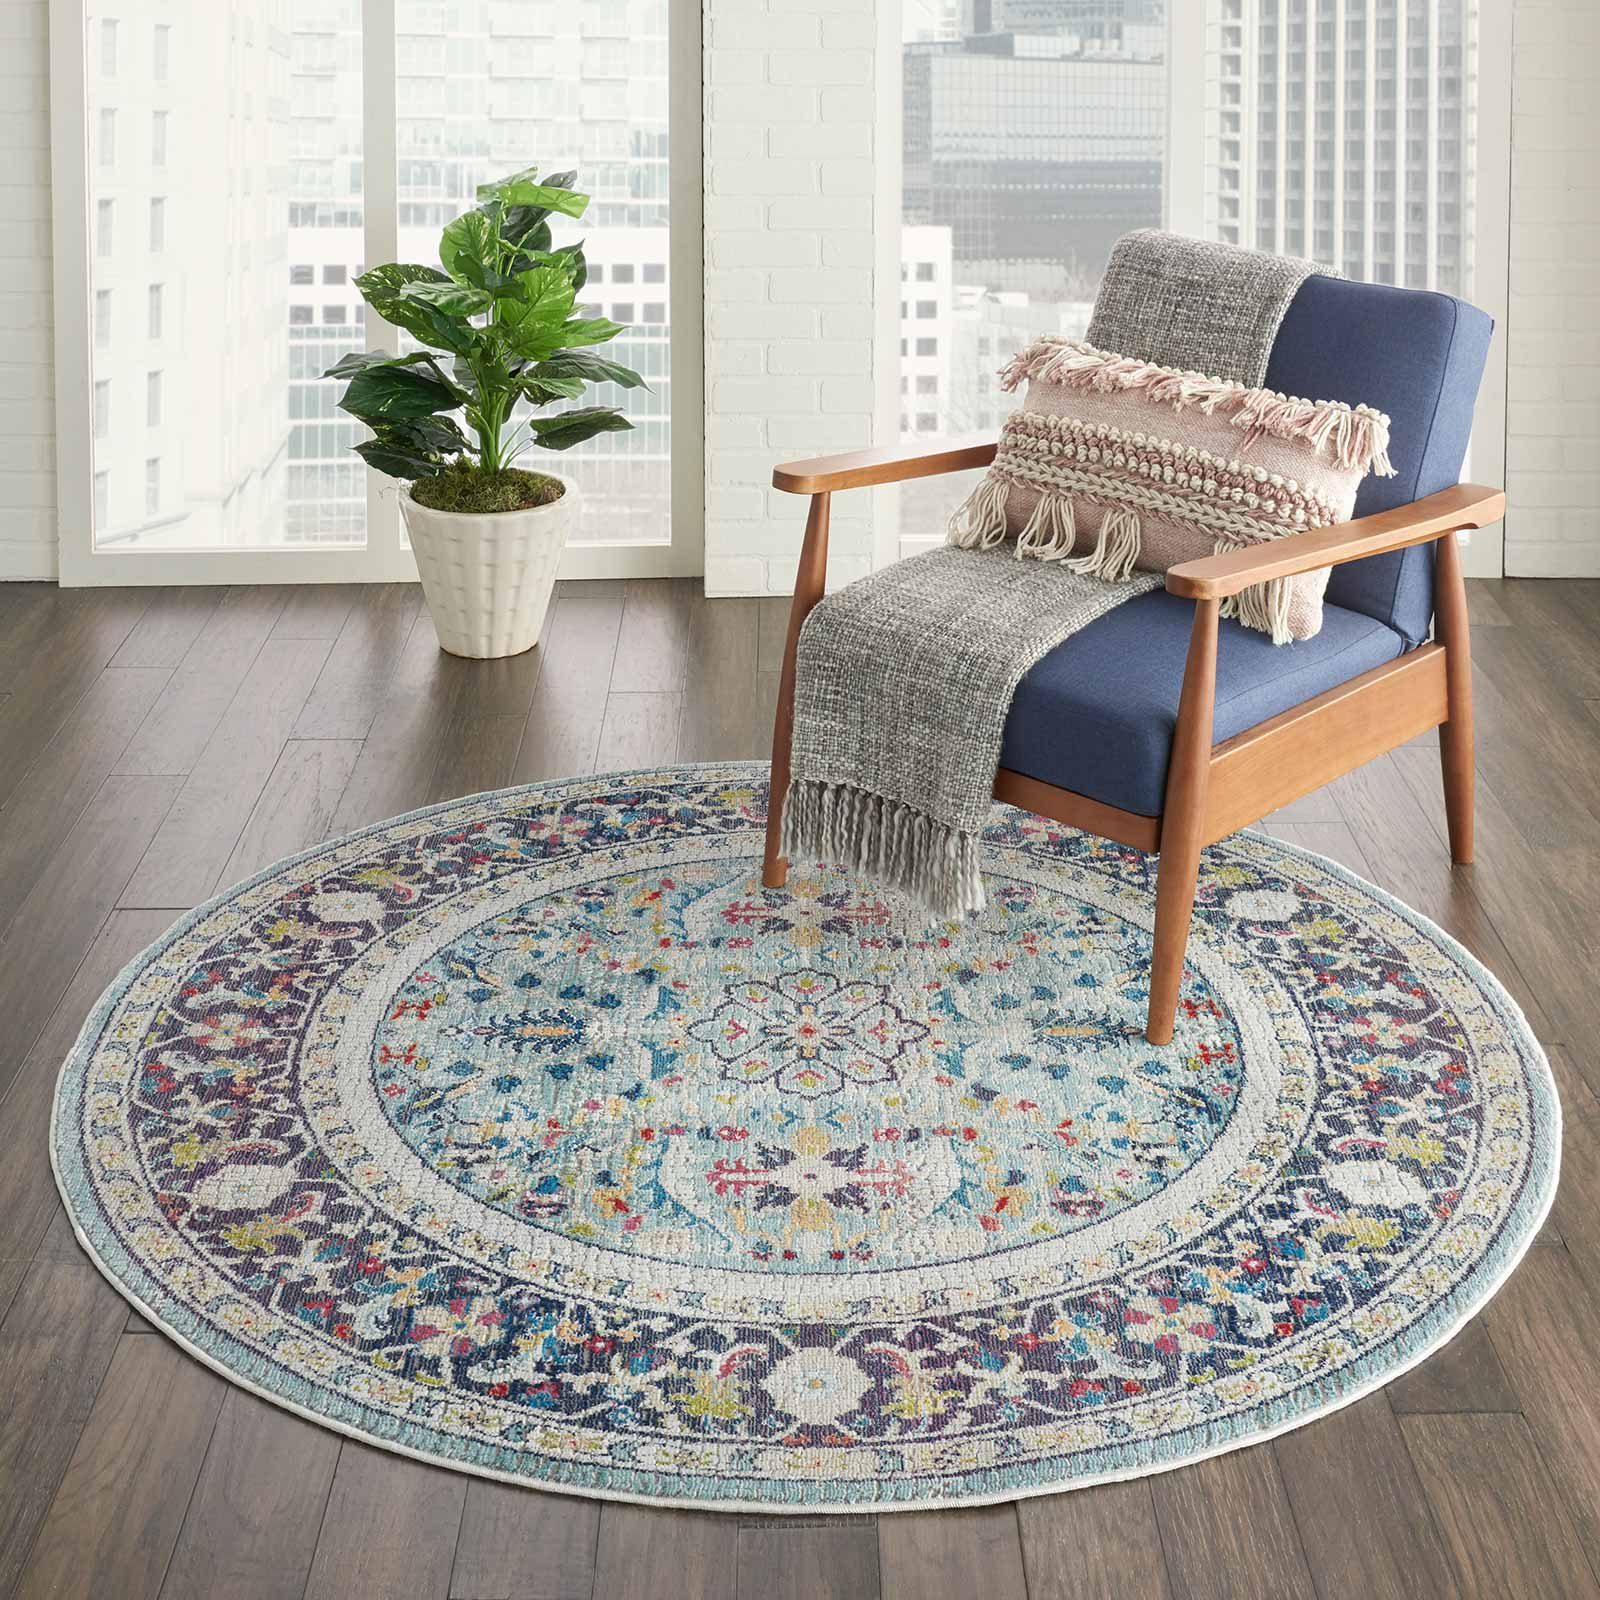 Nourison rug Ankara Global ANR14 TEAL MULTI 4xRND 099446498427 interior 1 C